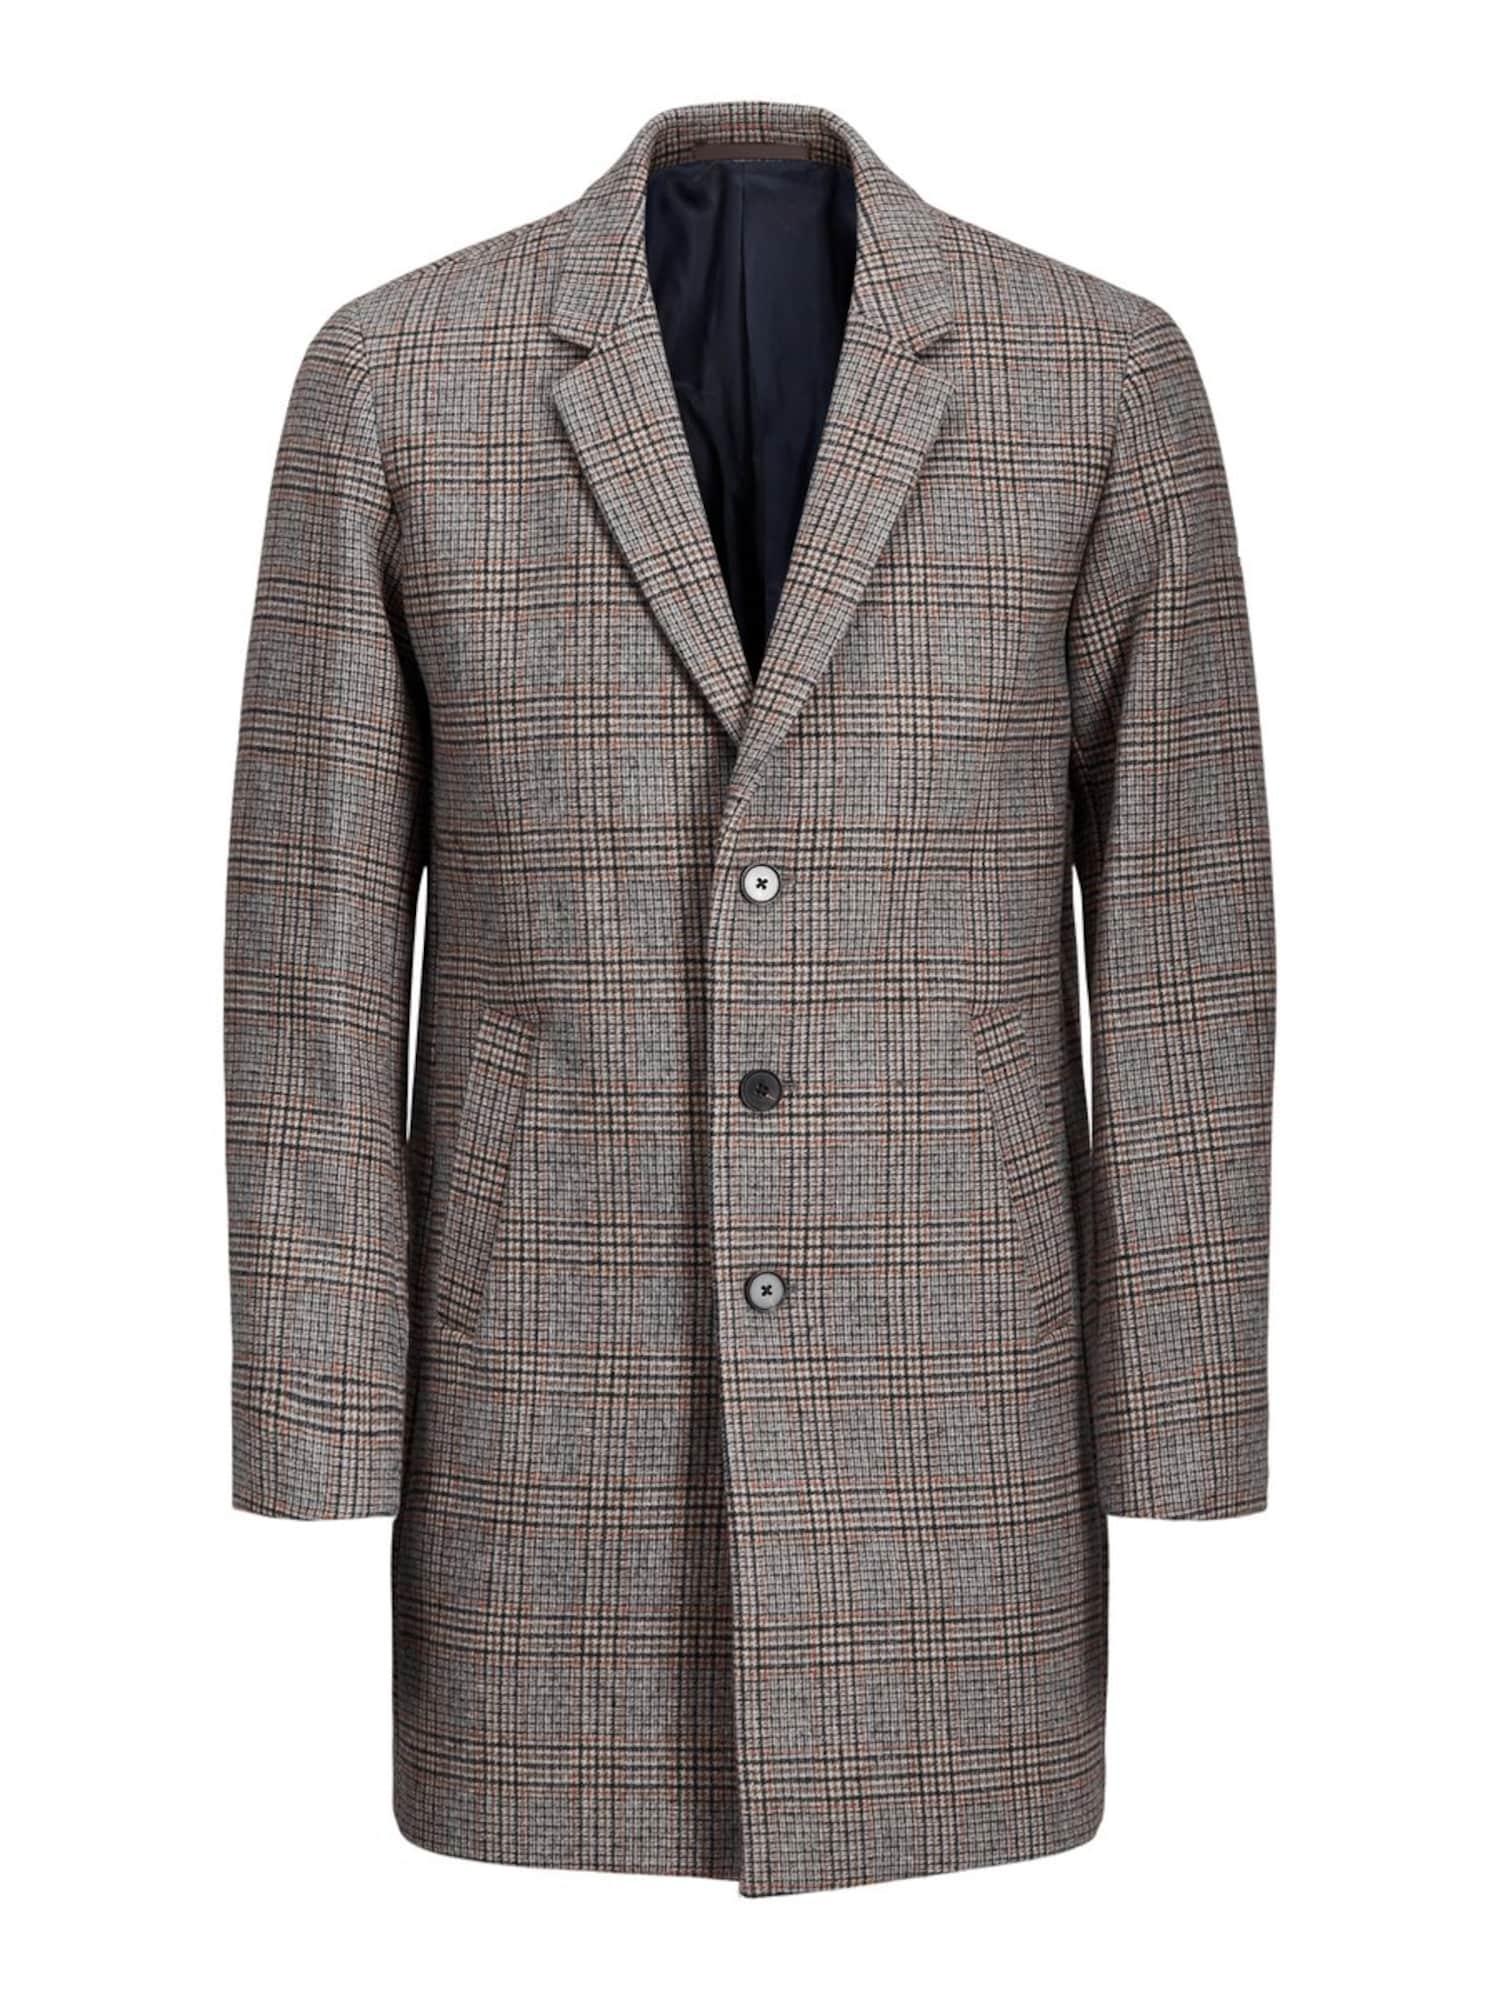 JACK & JONES Rudeninis-žieminis paltas margai ruda / bazalto pilka / margai pilka